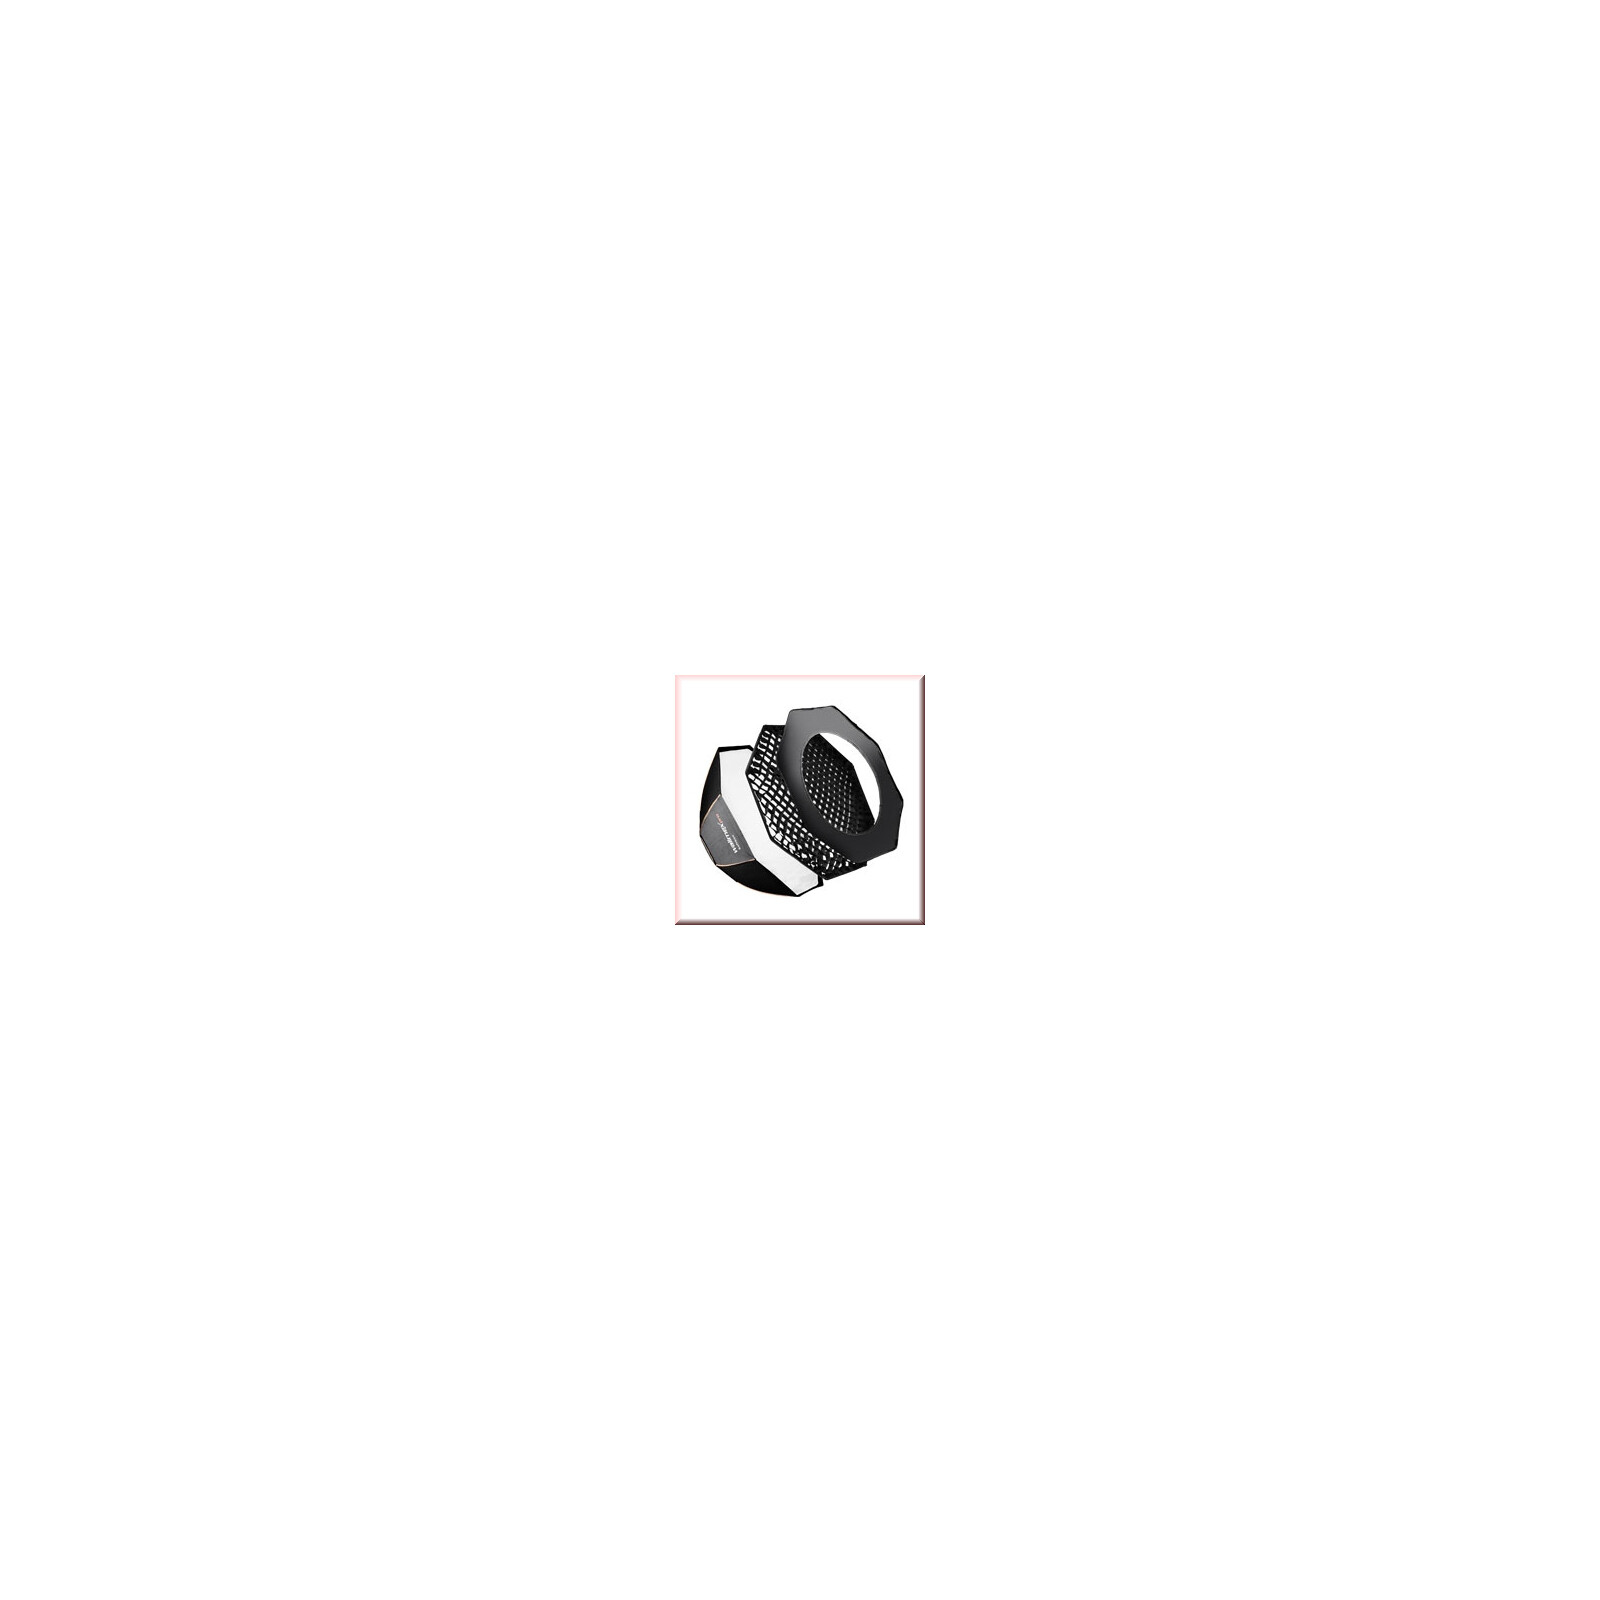 walimex pro Octagon Softbox PLUS OL Ø170 Profoto